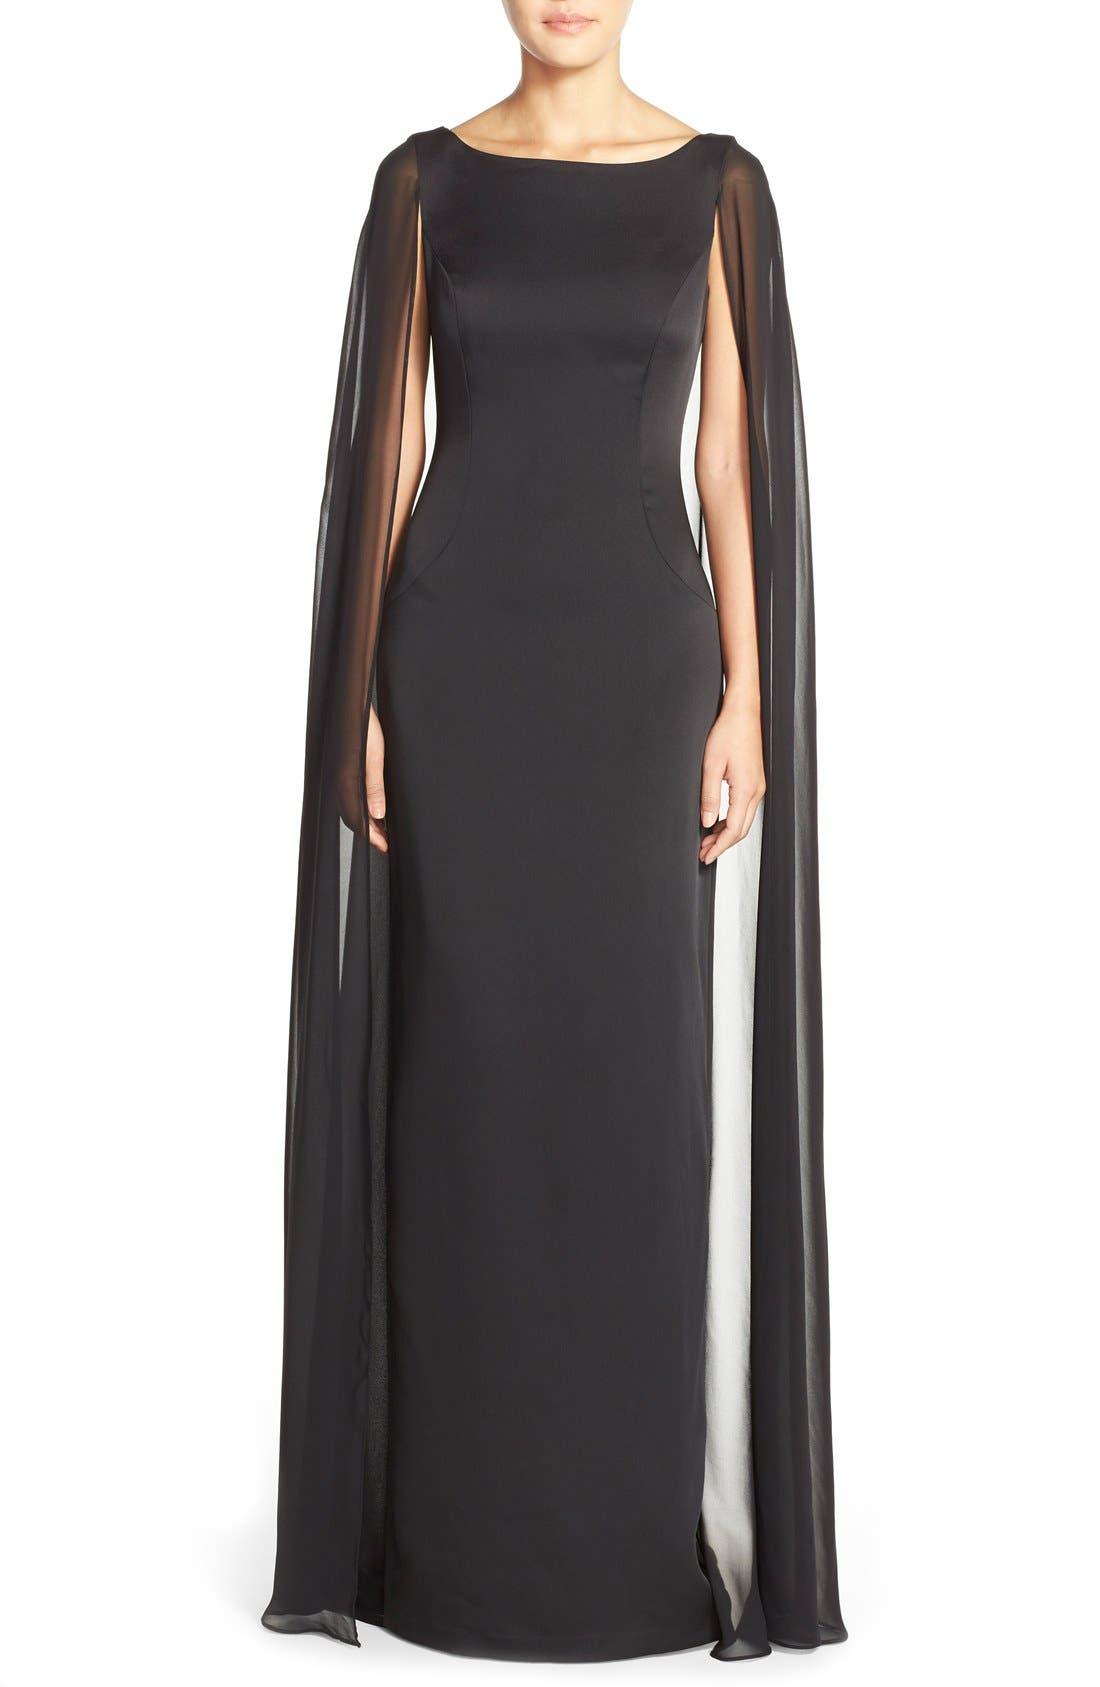 Main Image - Adrianna PapellSatin Column Gown withChiffon Cape